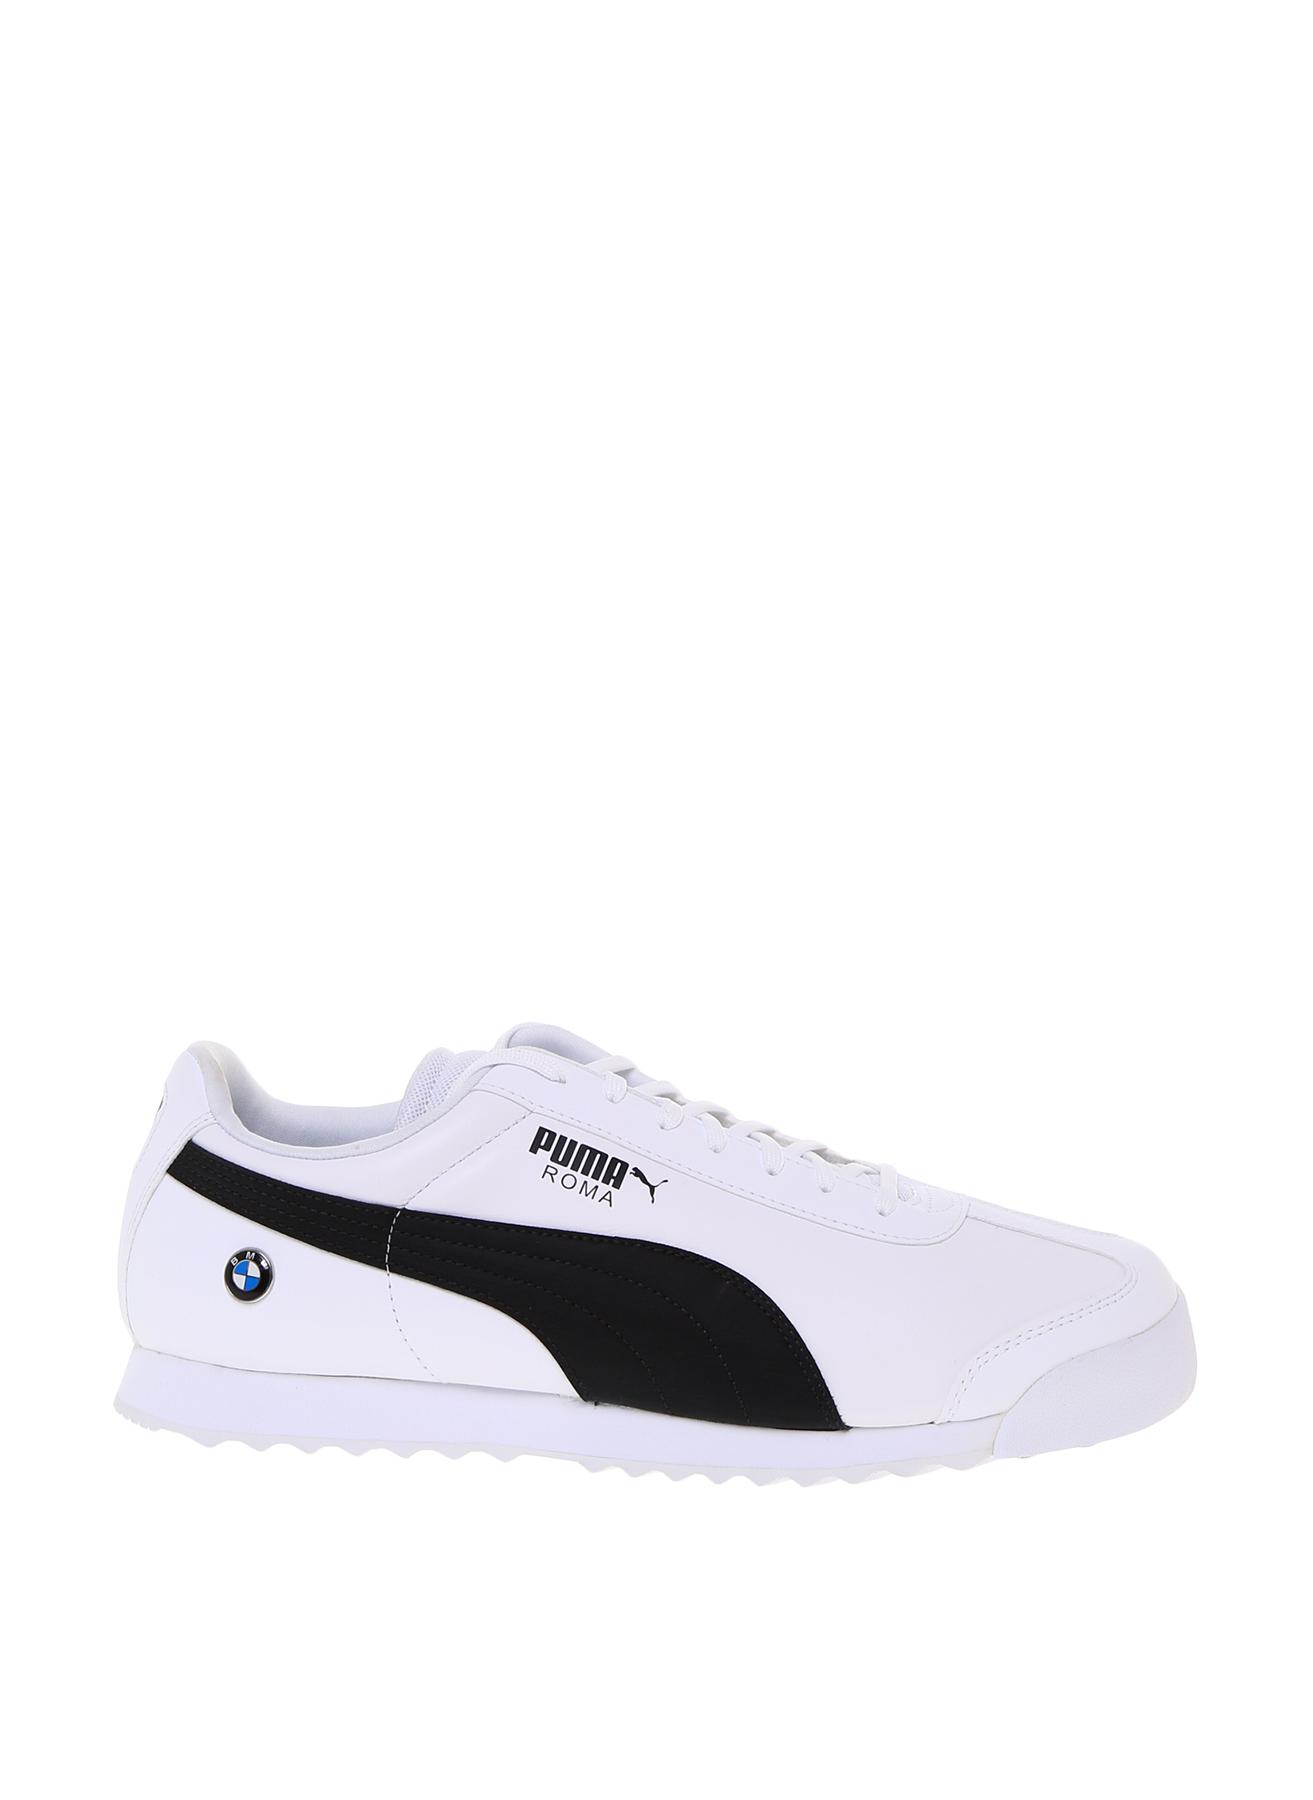 Puma Bmw MMS Roma Lifestyle Ayakkabı 42 5001632595004 Ürün Resmi